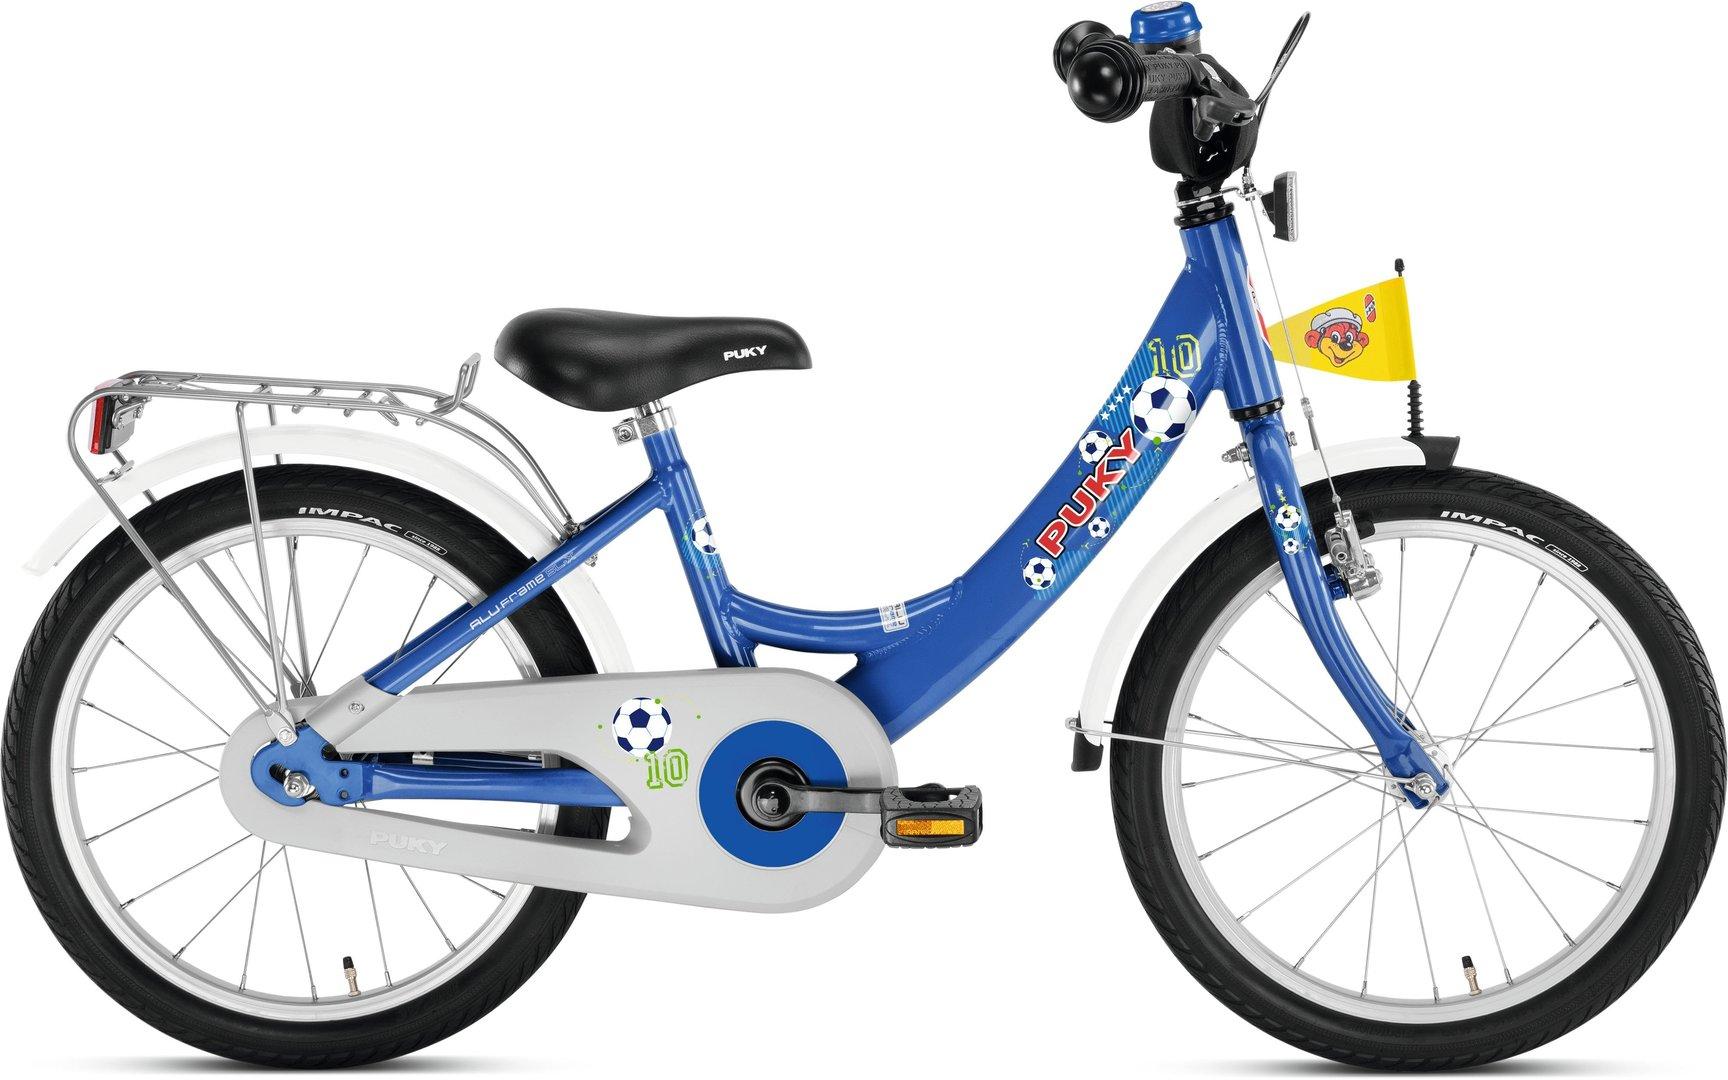 Puky Laufrad Beleuchtung | Puky Zl 18 1 Alu Blau Fussball Zeg Radsport Bieg Lorrach